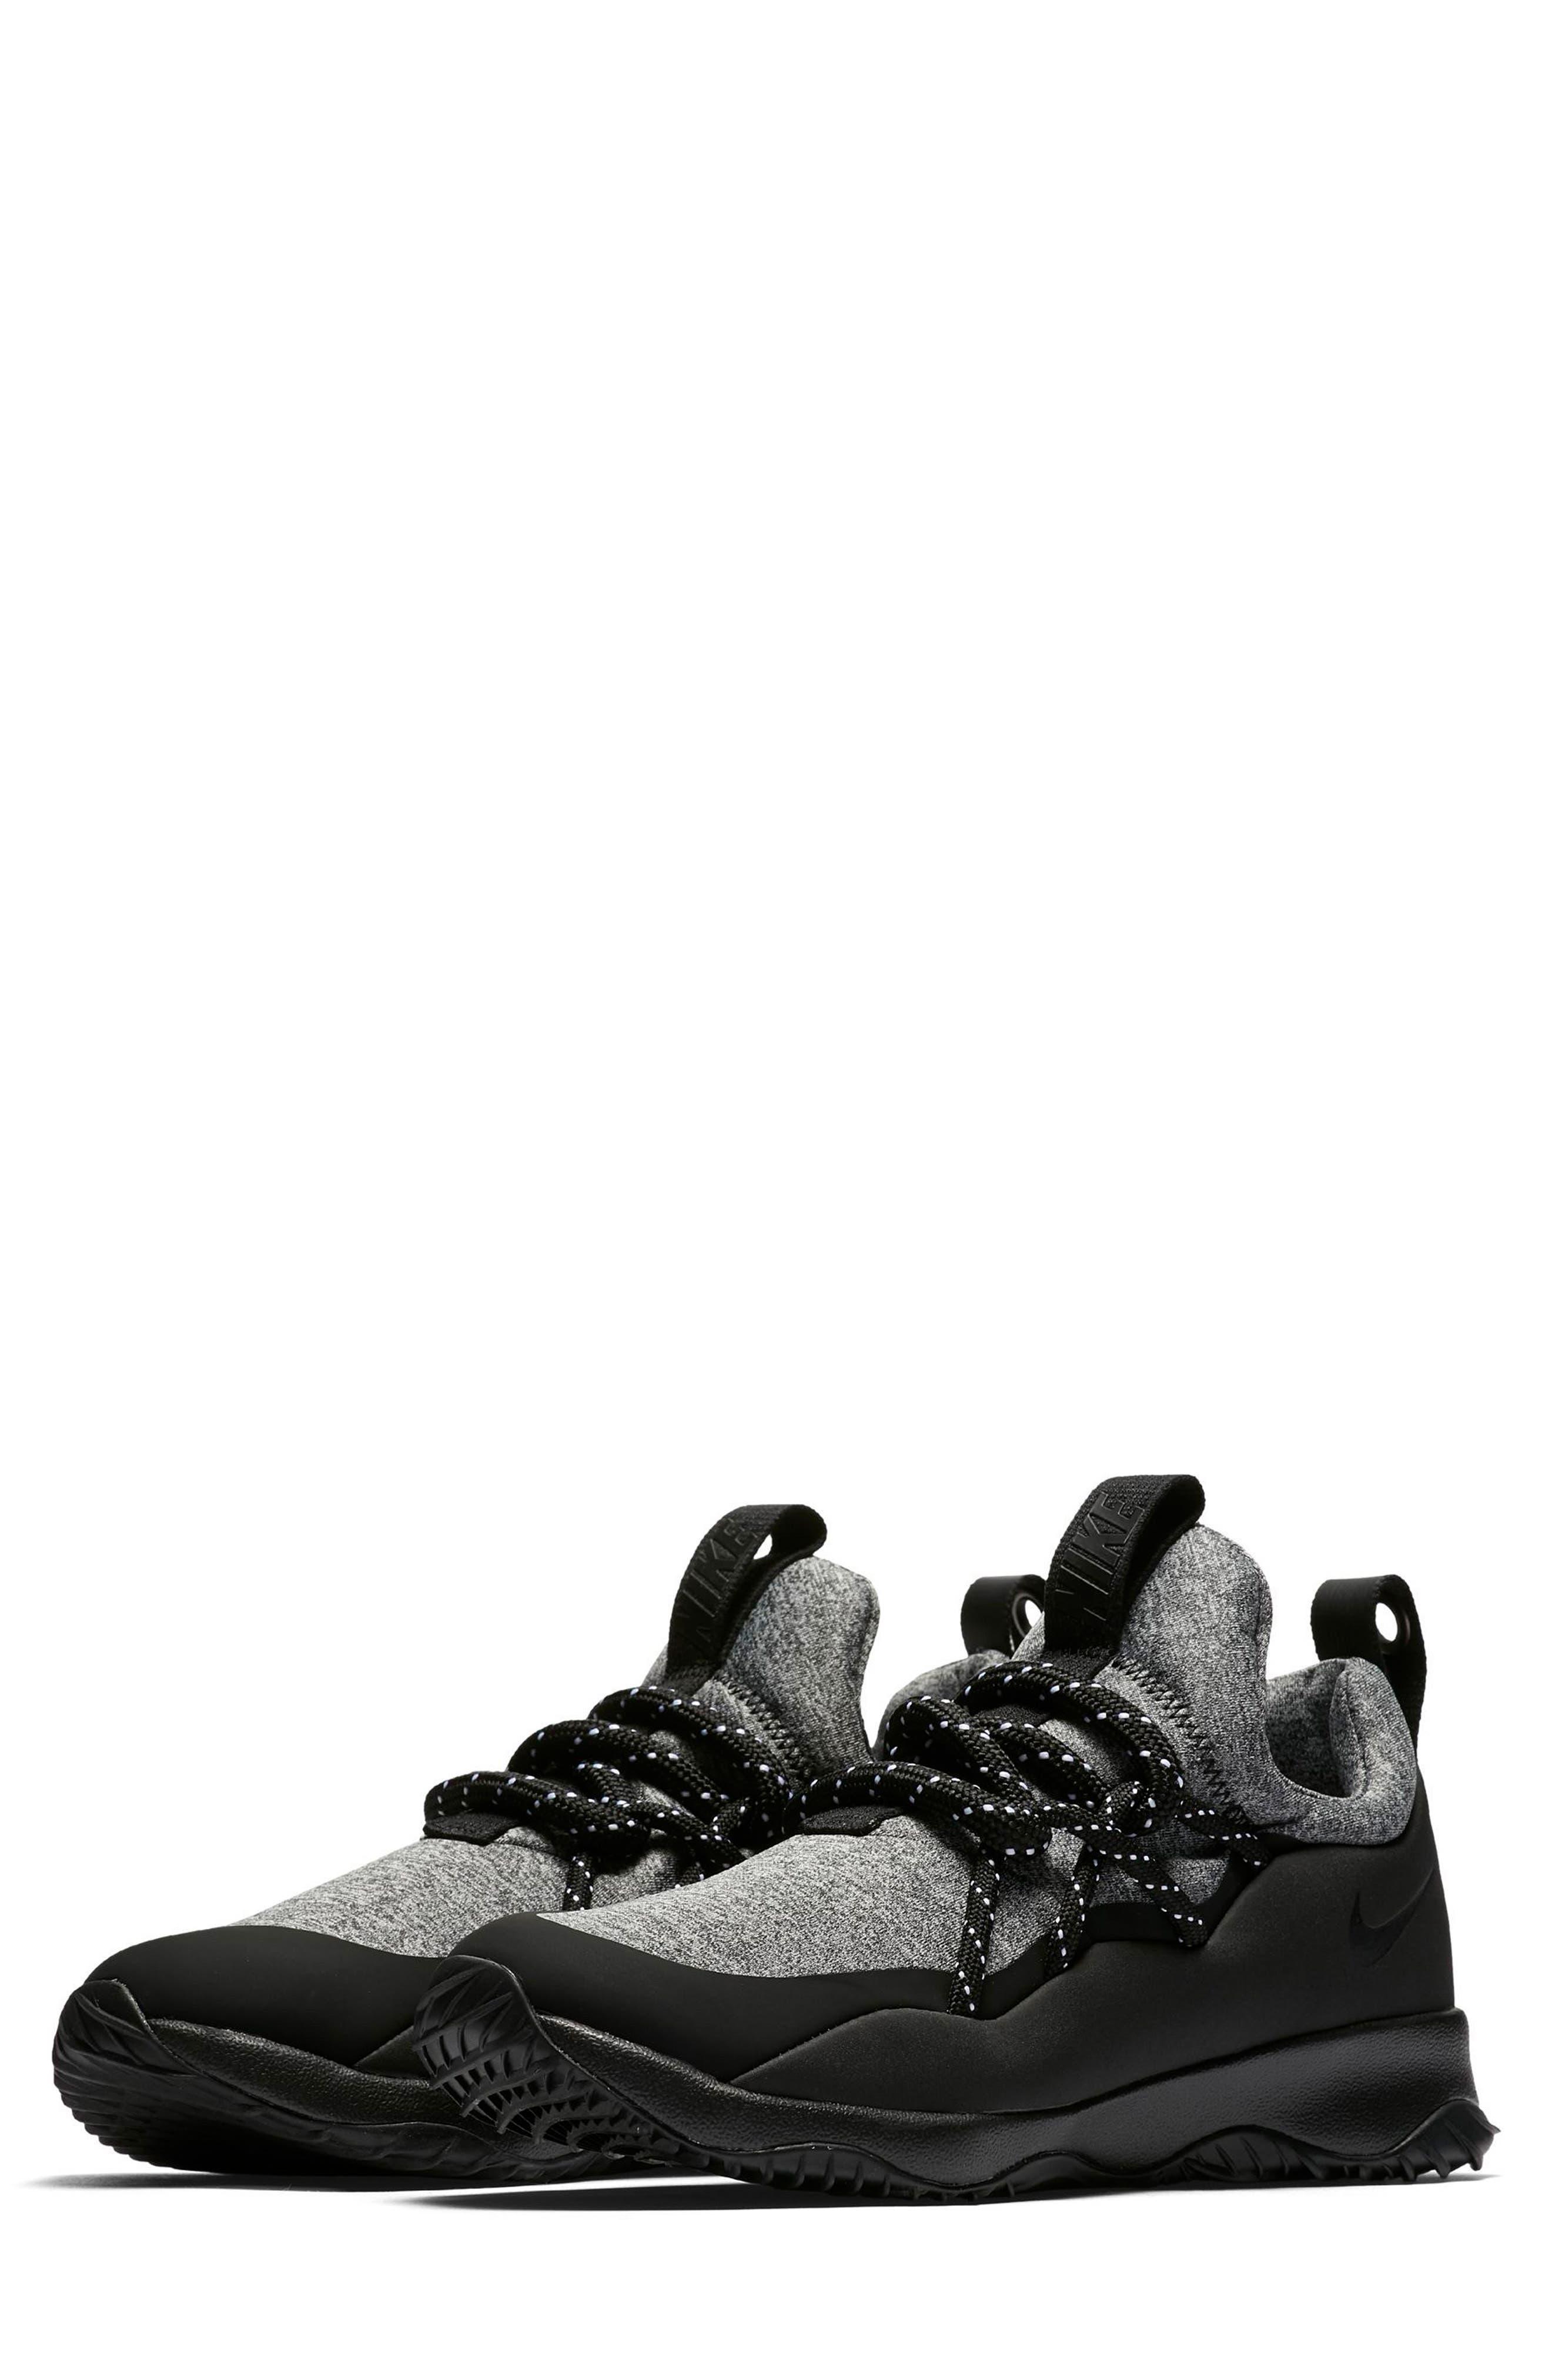 City Loop Sneaker,                         Main,                         color, Black/ Black/ White